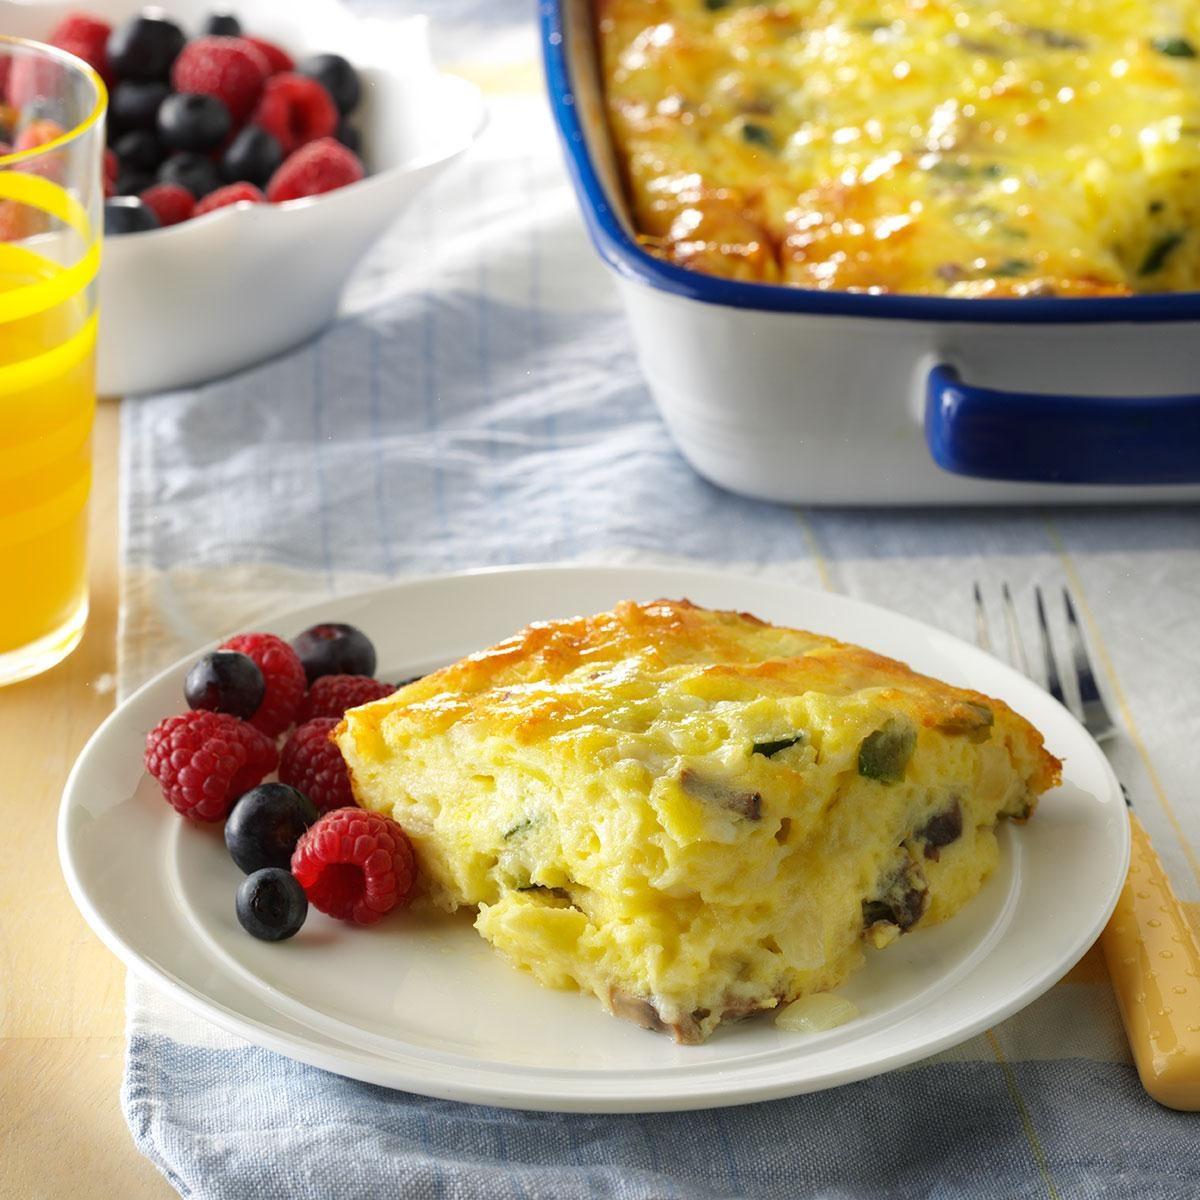 Vegetable Egg Breakfast Casserole: Cheesy Vegetable Egg Dish Recipe